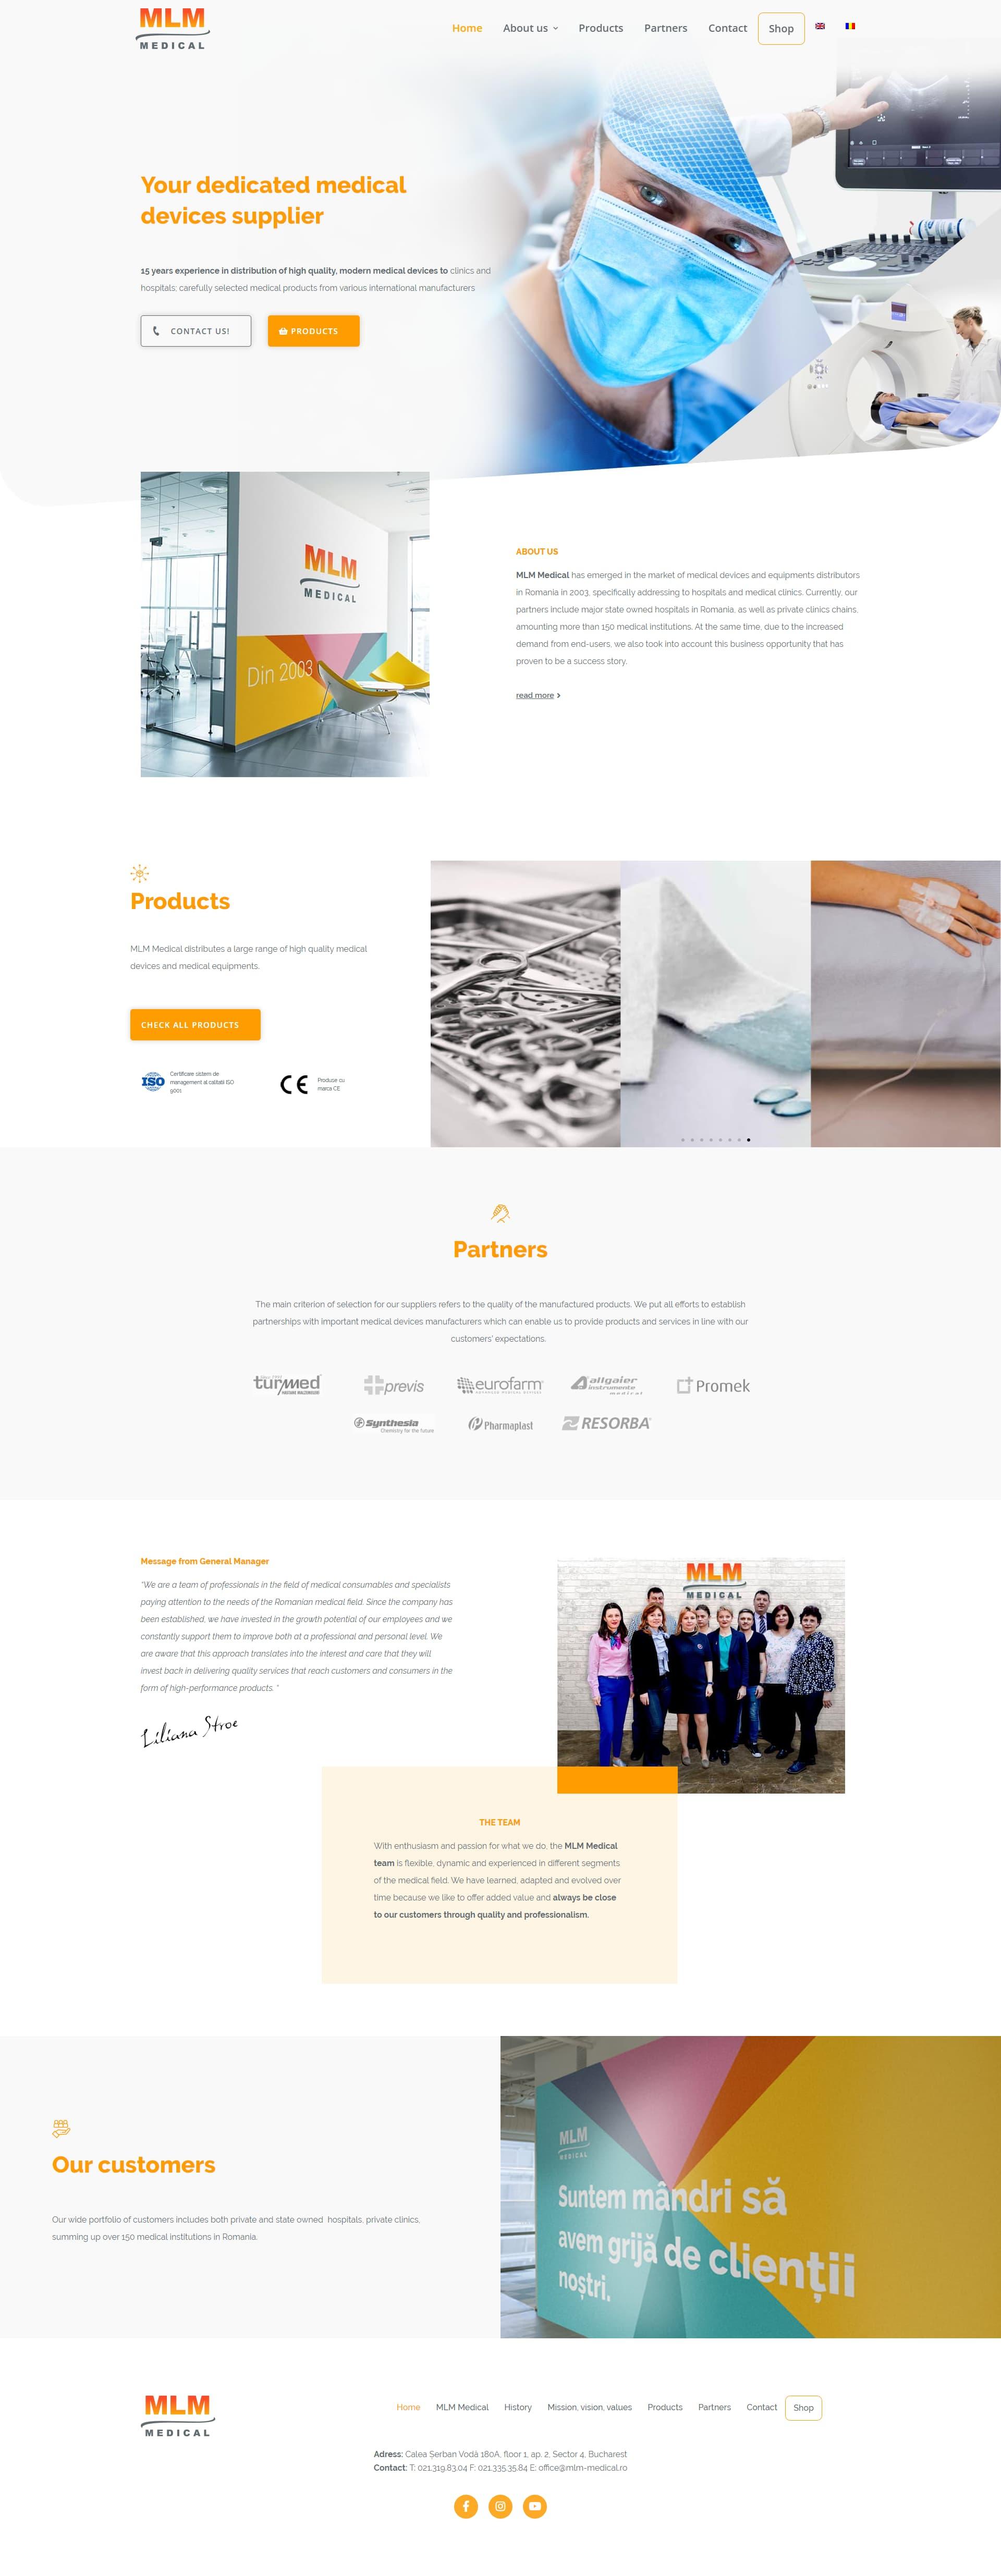 mlm-homepage